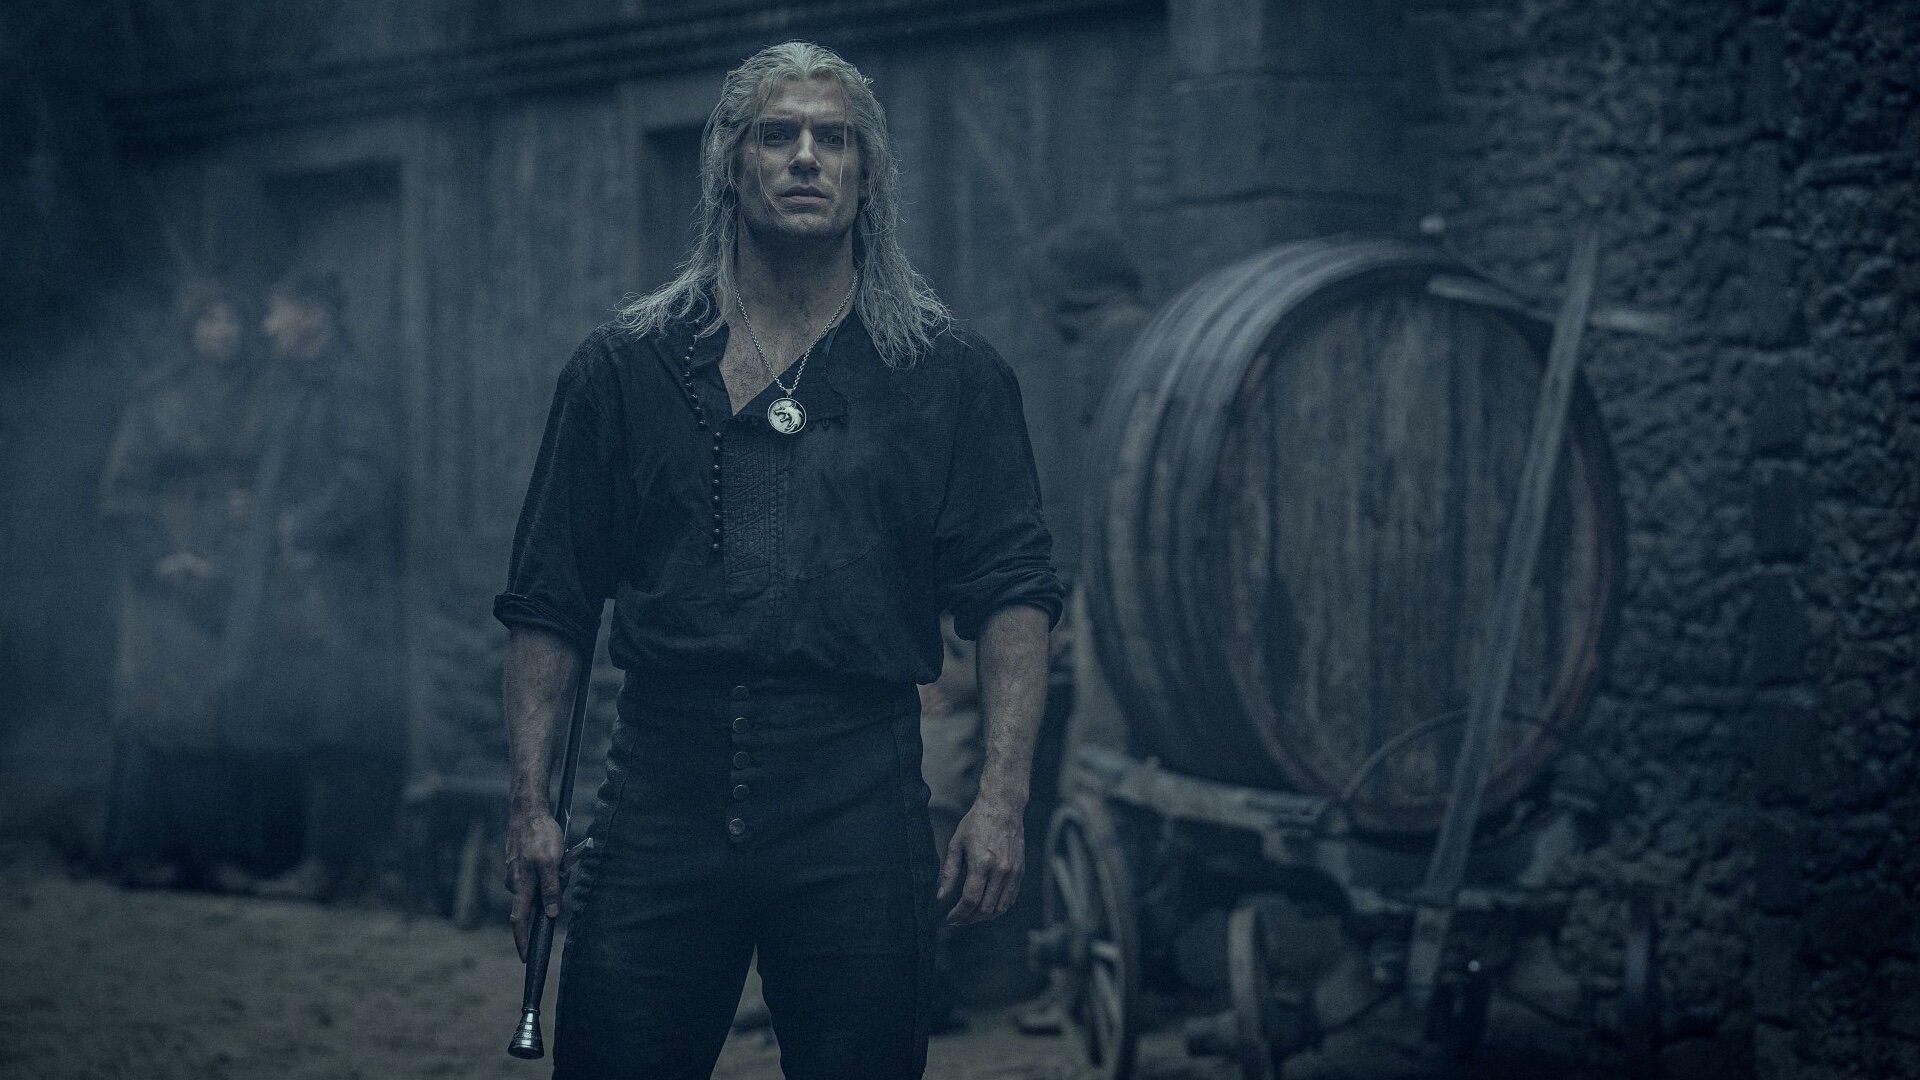 The Witcher Netflix wallpaper photo